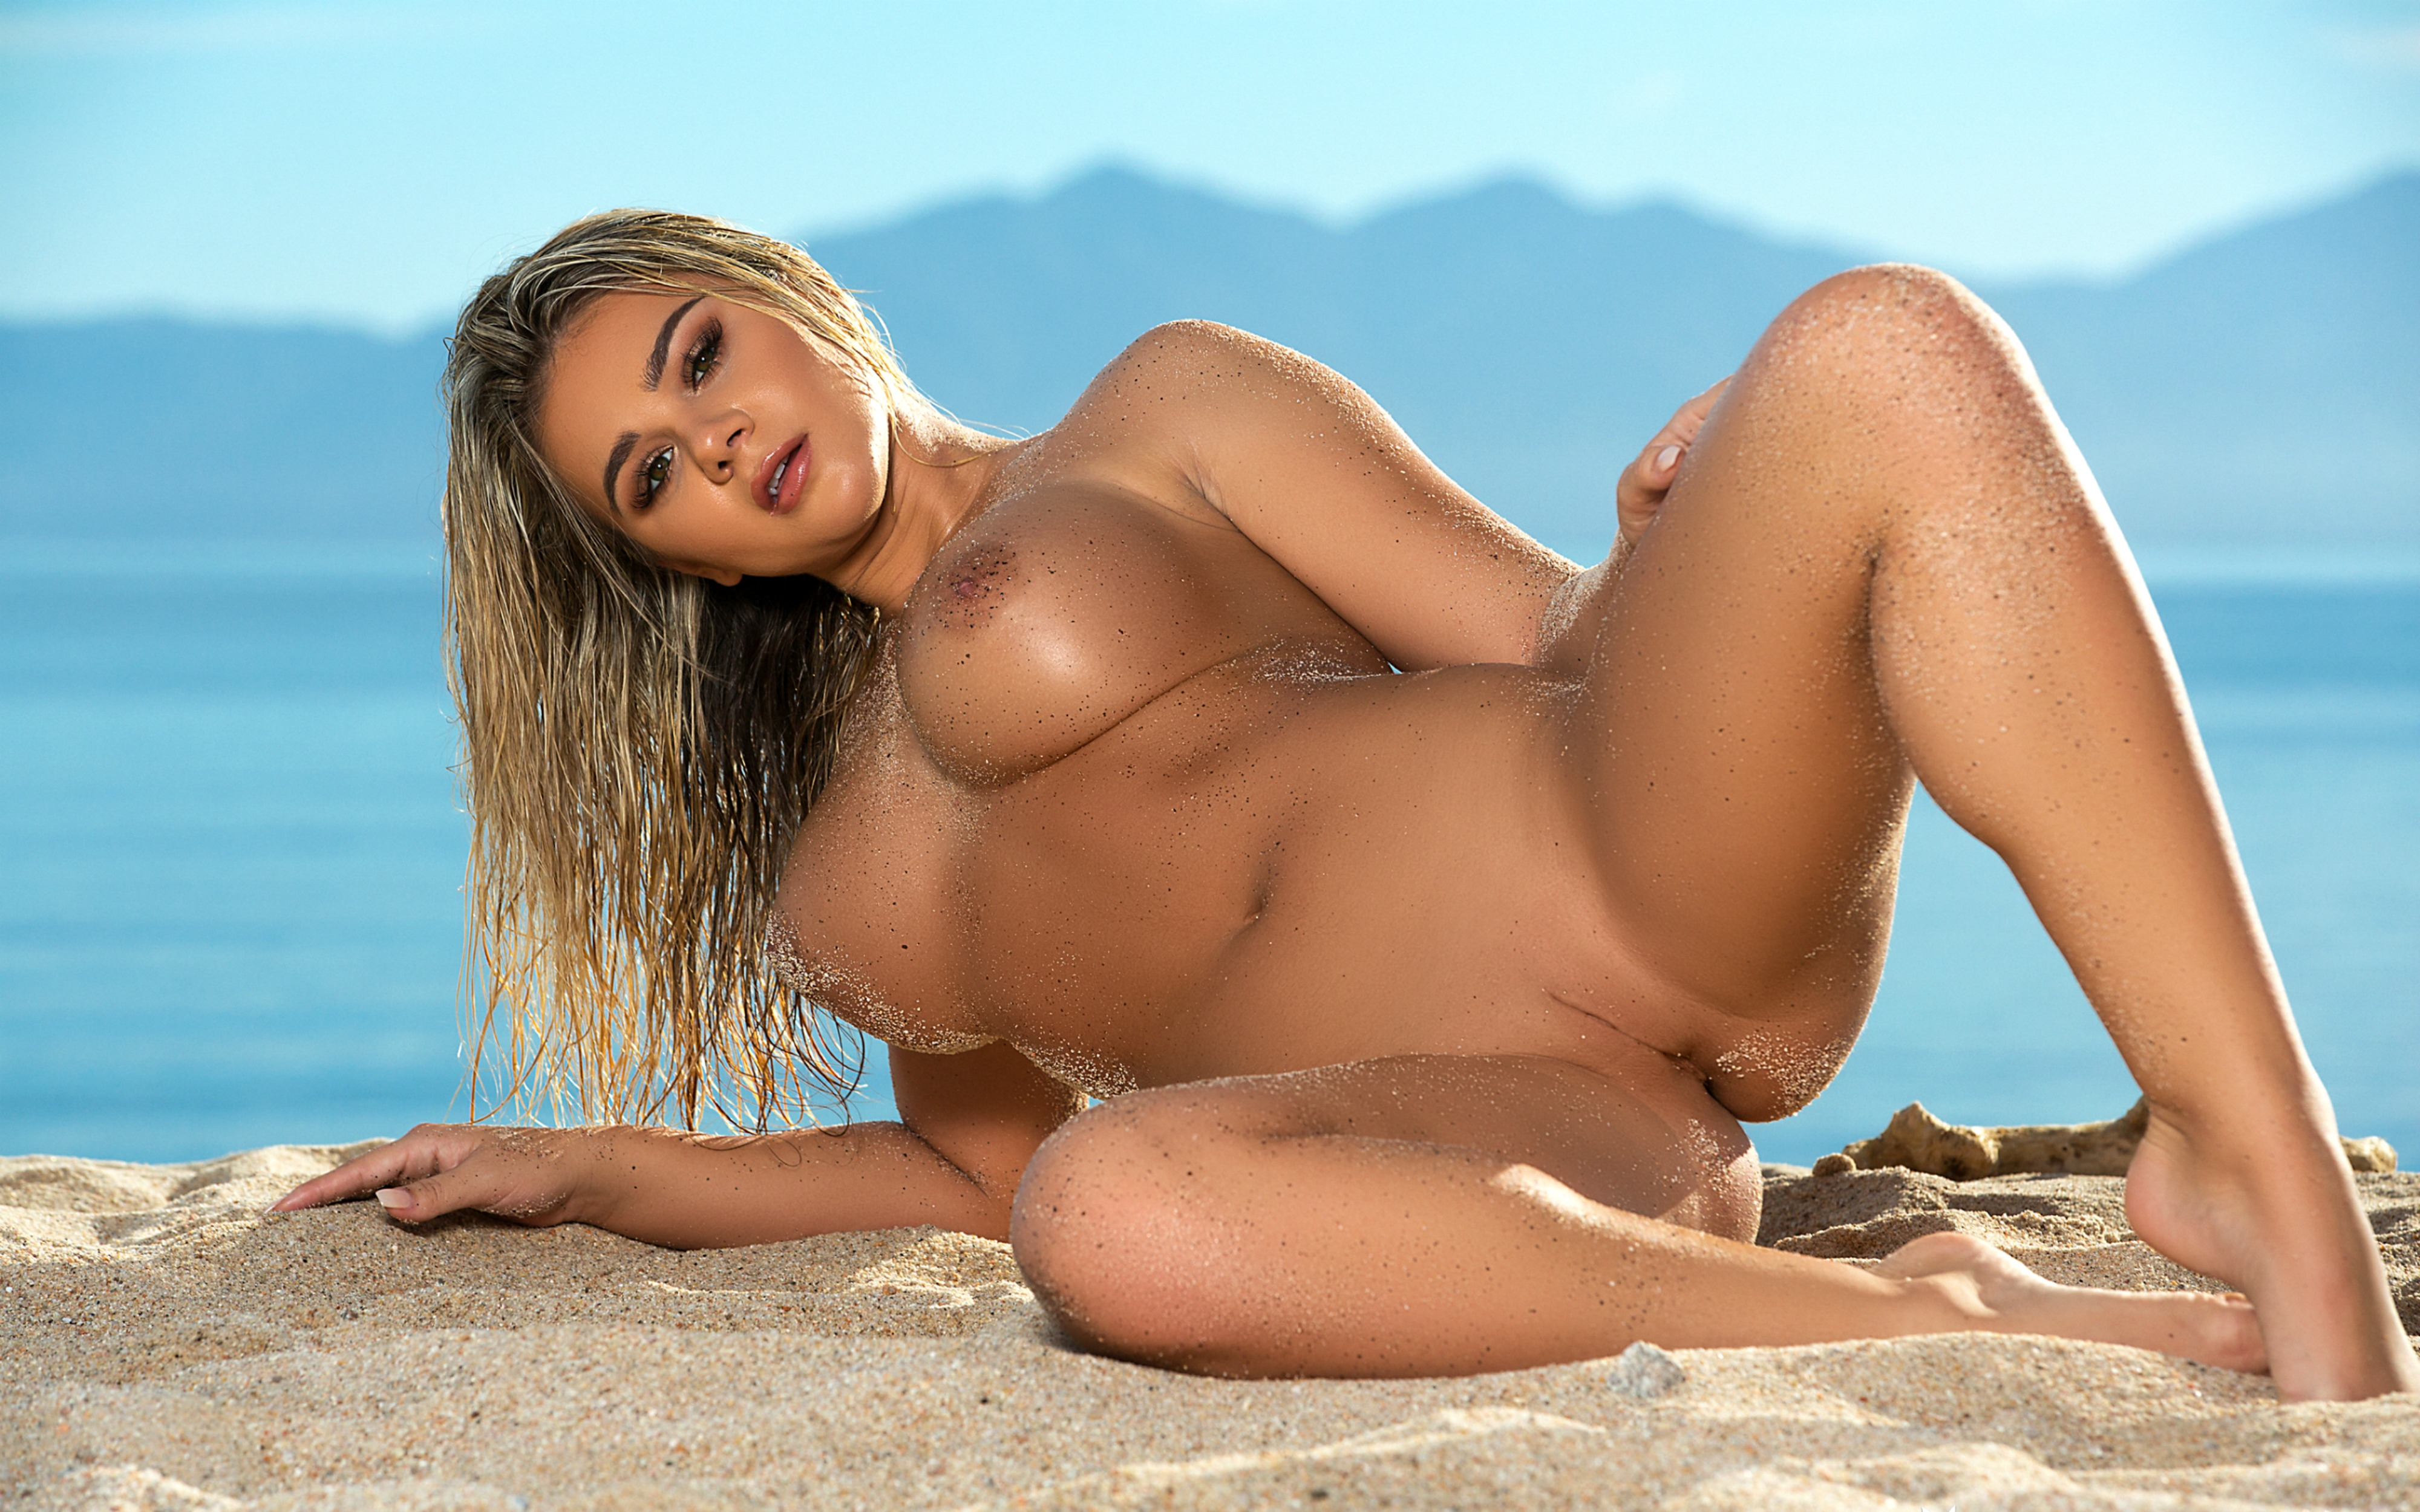 mallu actress porn photos